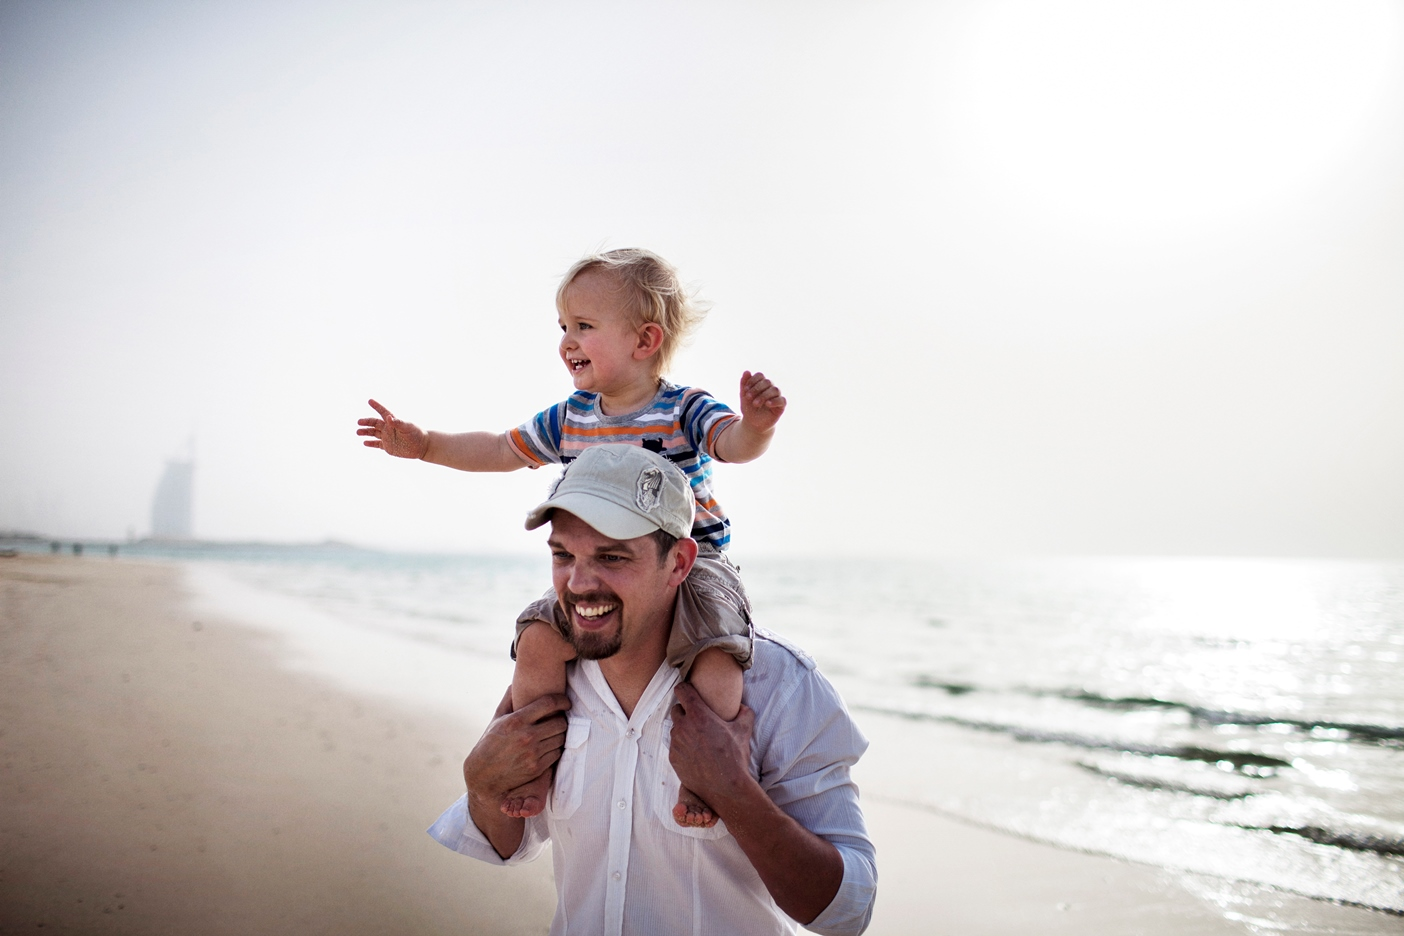 Dubai Beach - Photo credit visitdubai.com